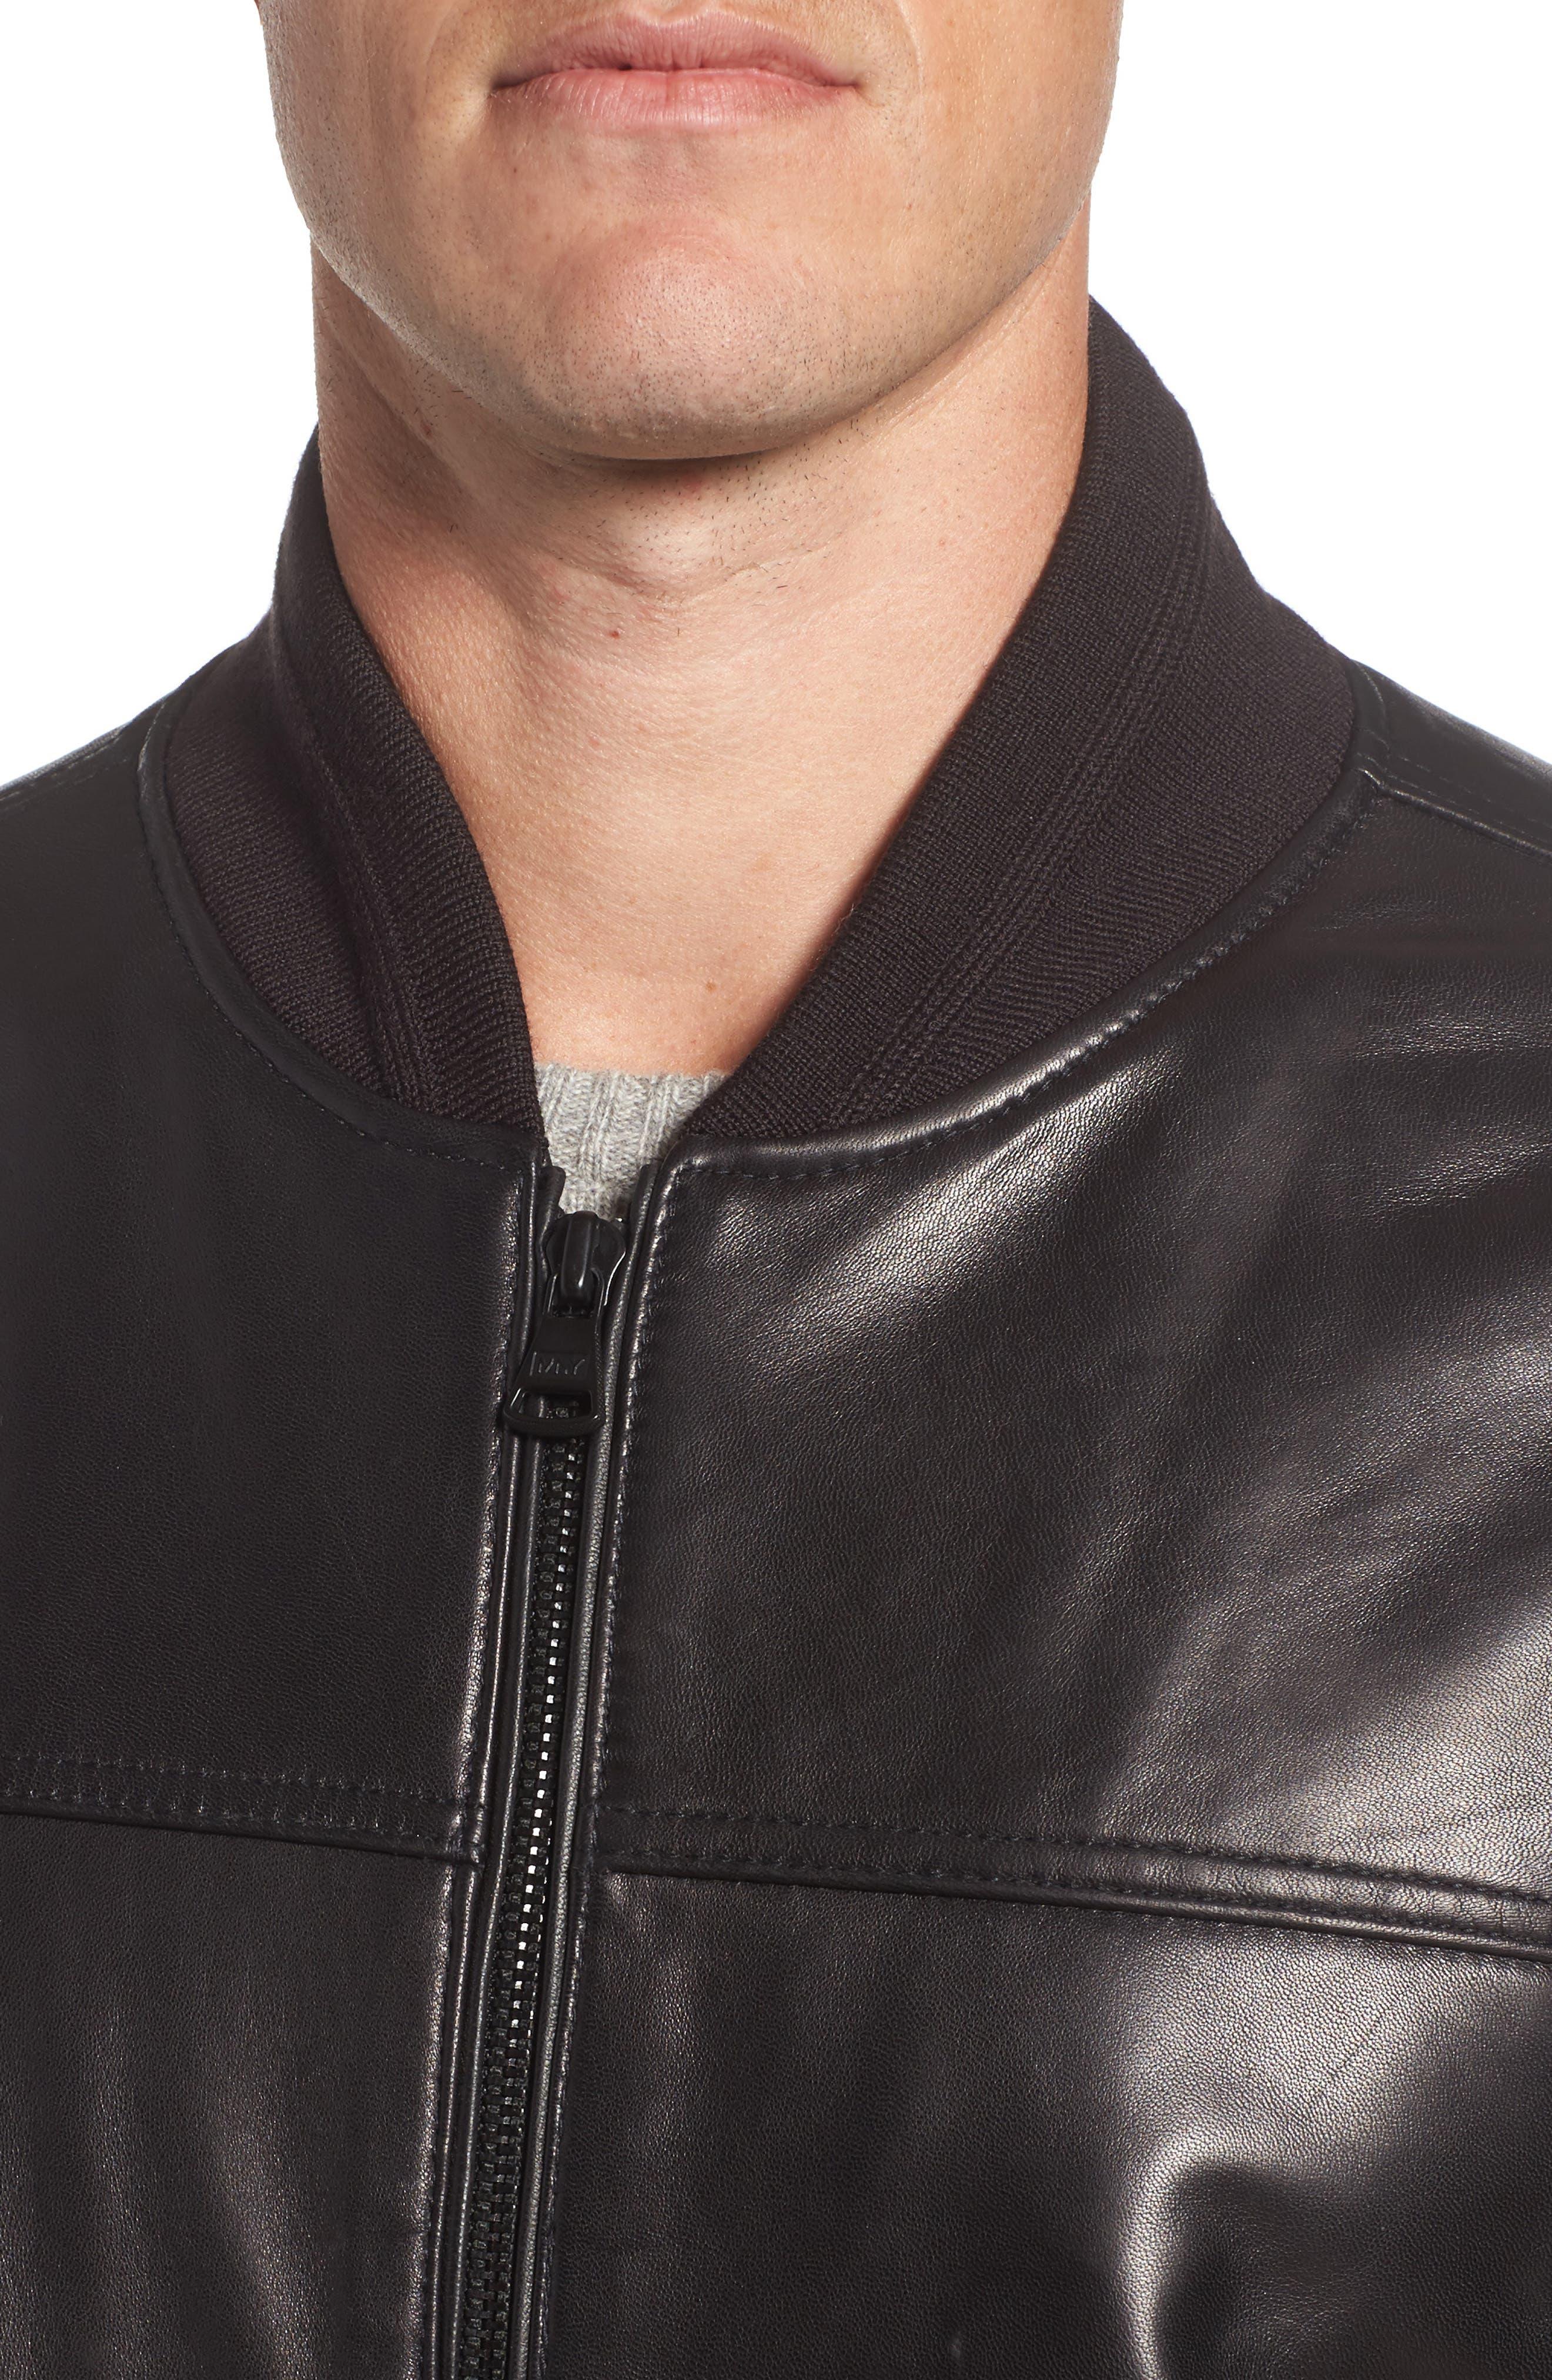 Summit Leather Bomber Jacket,                             Alternate thumbnail 4, color,                             001